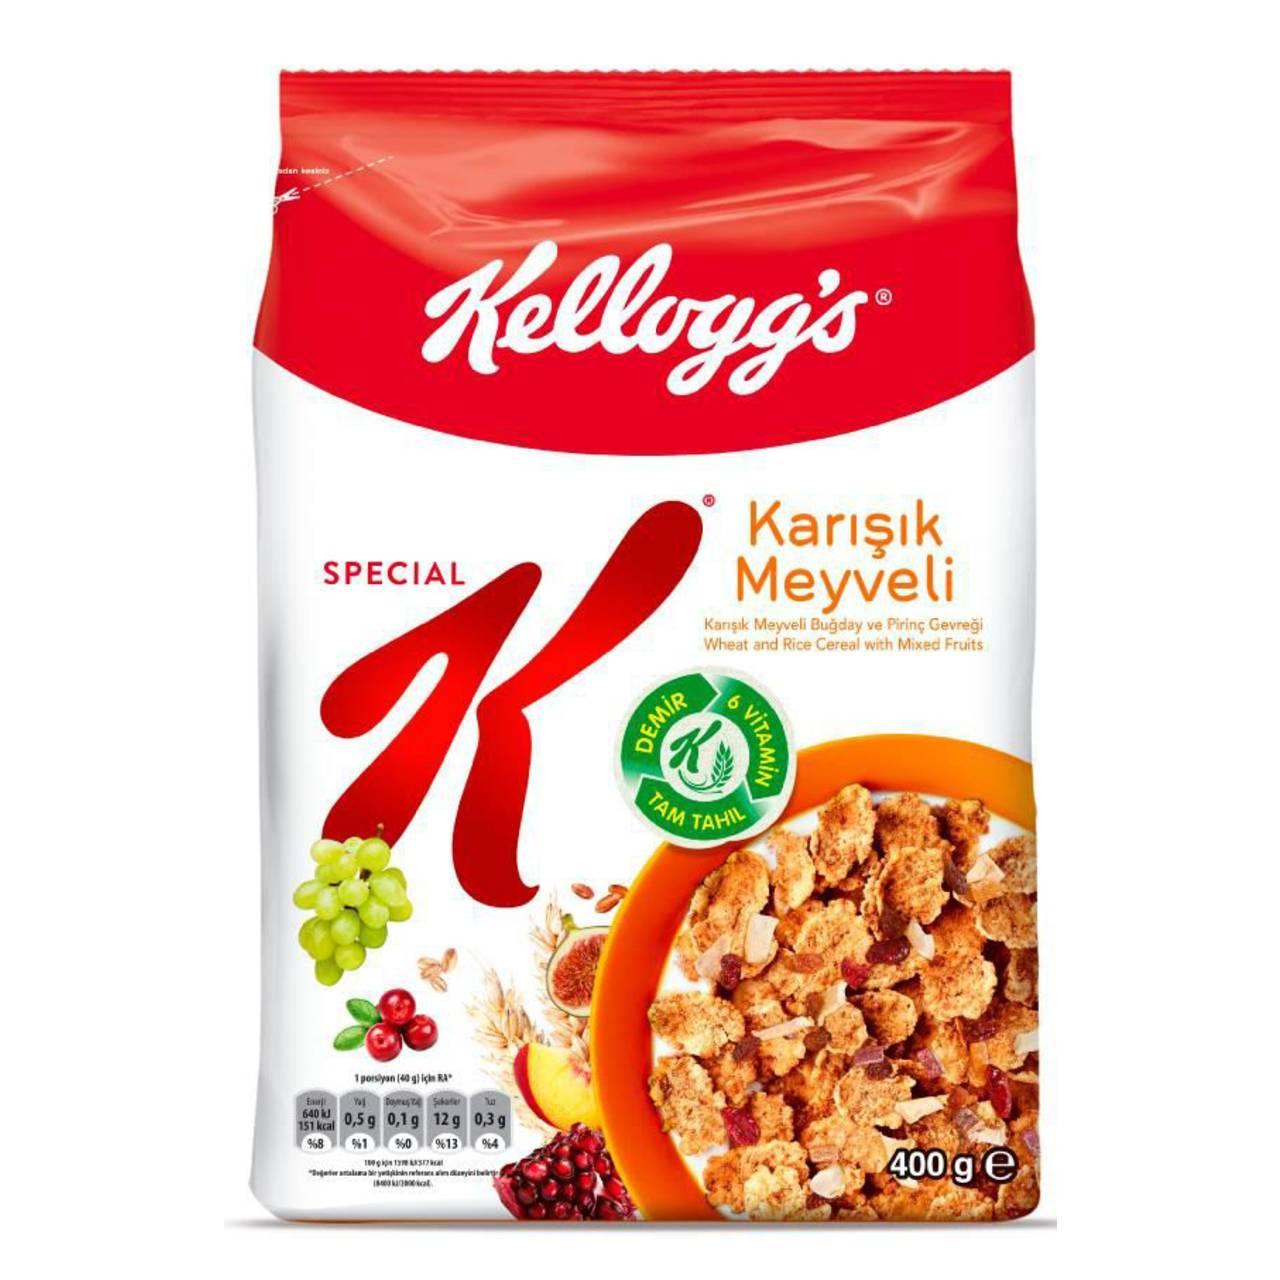 کورن فلکس مخلوط میوه اسپشیال کلاگز (Kelloggs Special ) SPECIAL K - کورن فلکس مخلوط میوه اسپشیال کلاگز (Kelloggs Special ) SPECIAL K